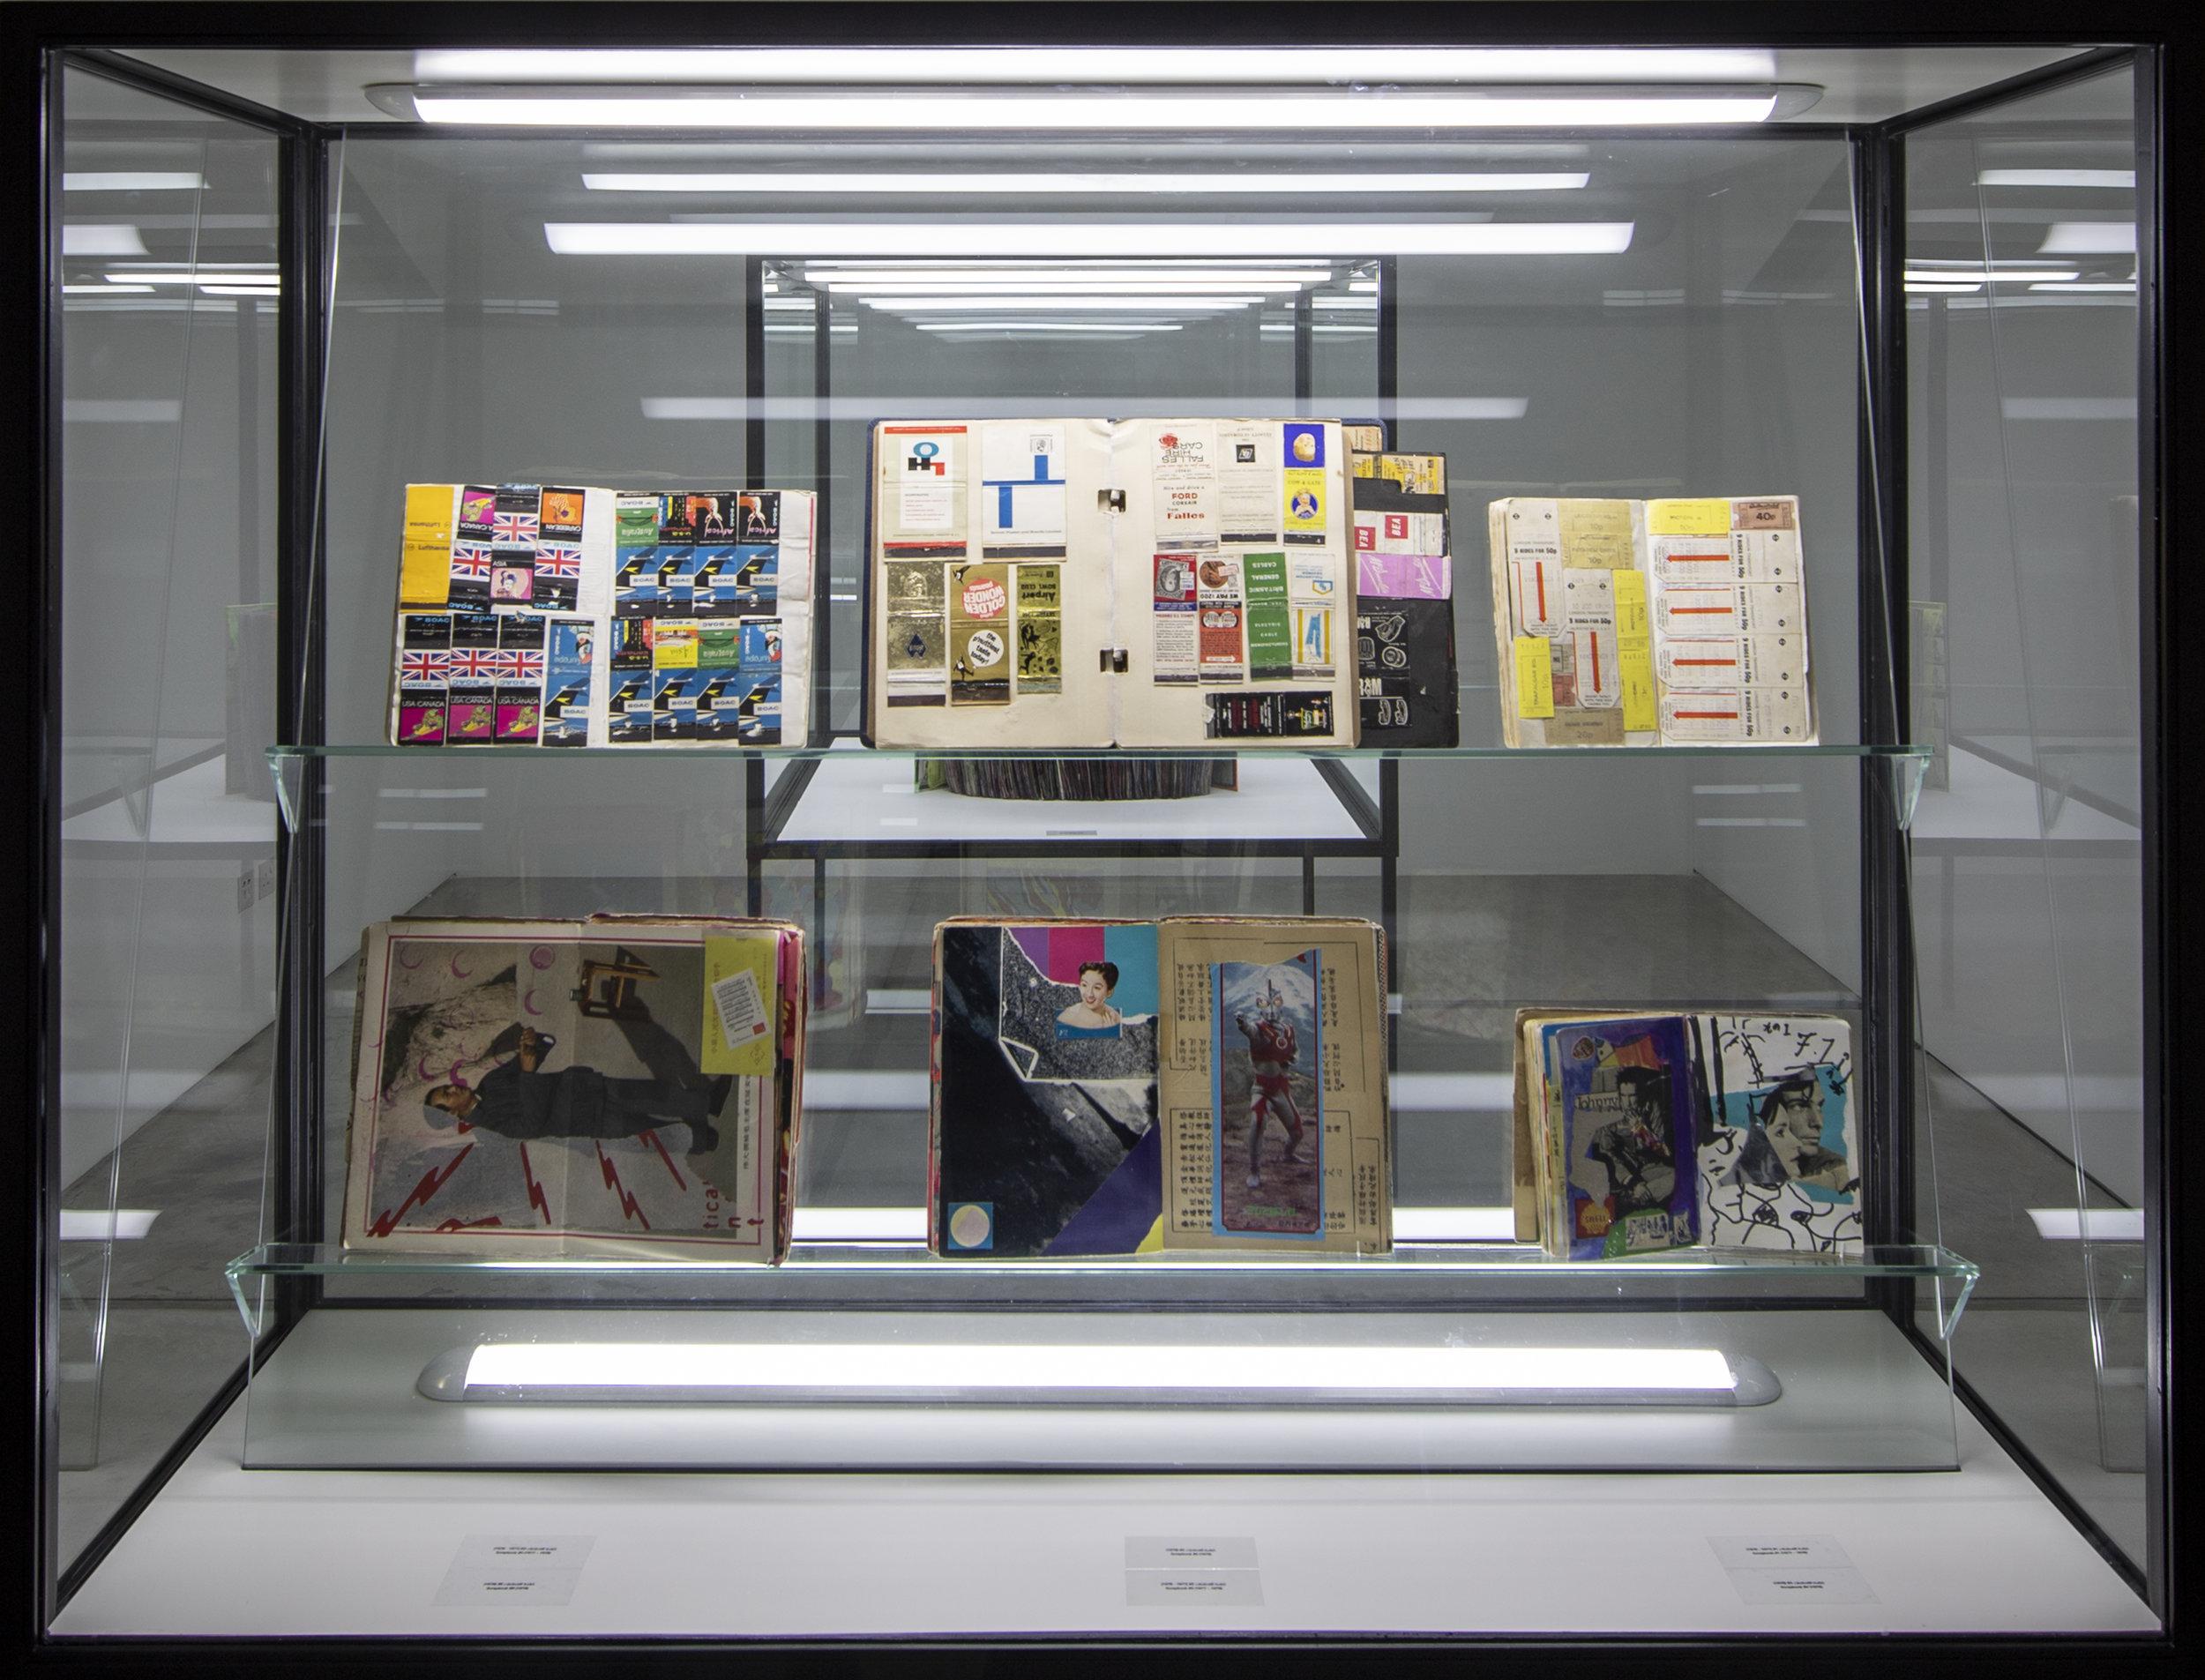 Installation view of Shinro Ohtake's work, Al Hamriyah Studios, Sharjah Art Foundation, 2018. Mixed Media Installation, dimensions variable. Image courtesy of Sharjah Art Foundation